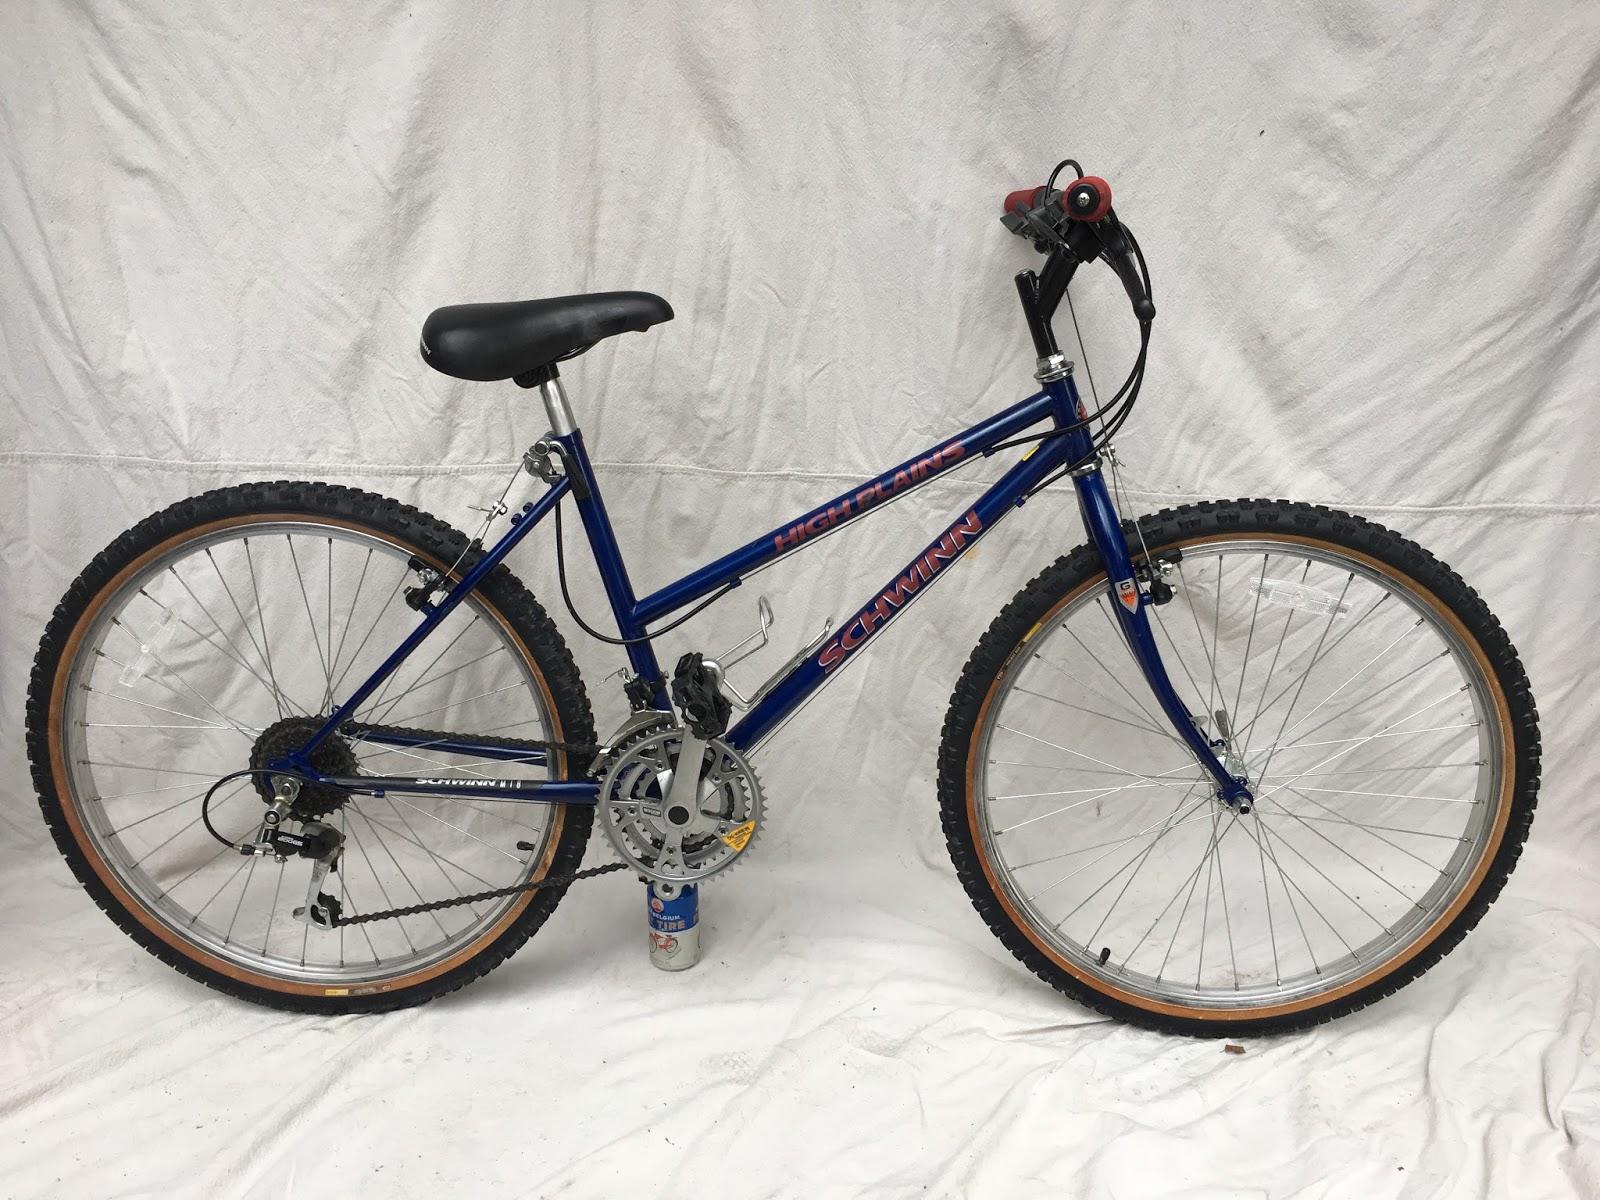 1f68fbefb28 1990 Red Schwinn High Plains 21 Speed Step Thru Mountain Bike- SOLD ...